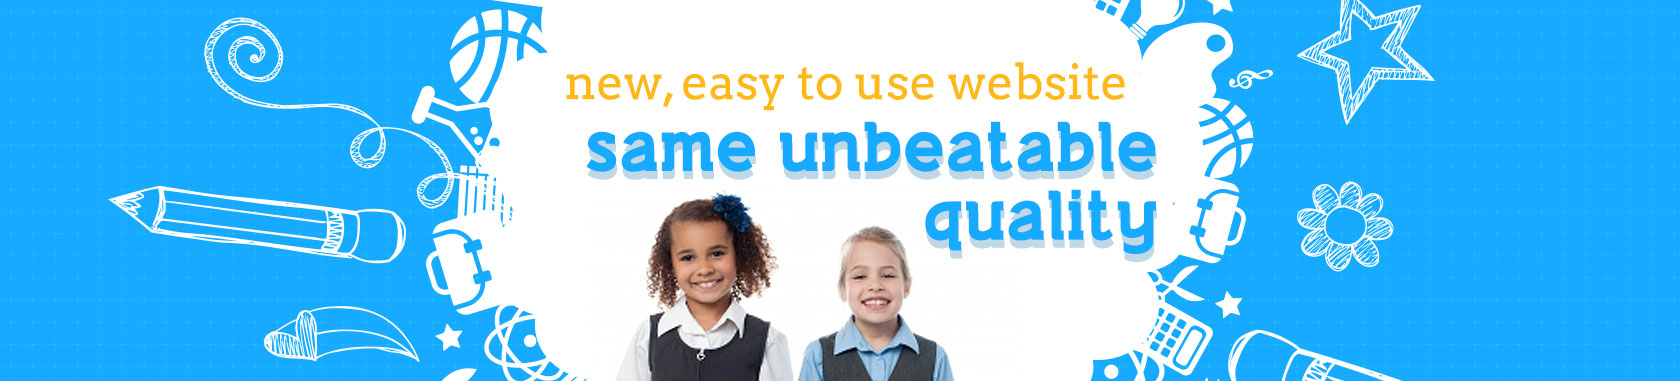 Buy School Uniforms Online Direct School Wear Uk